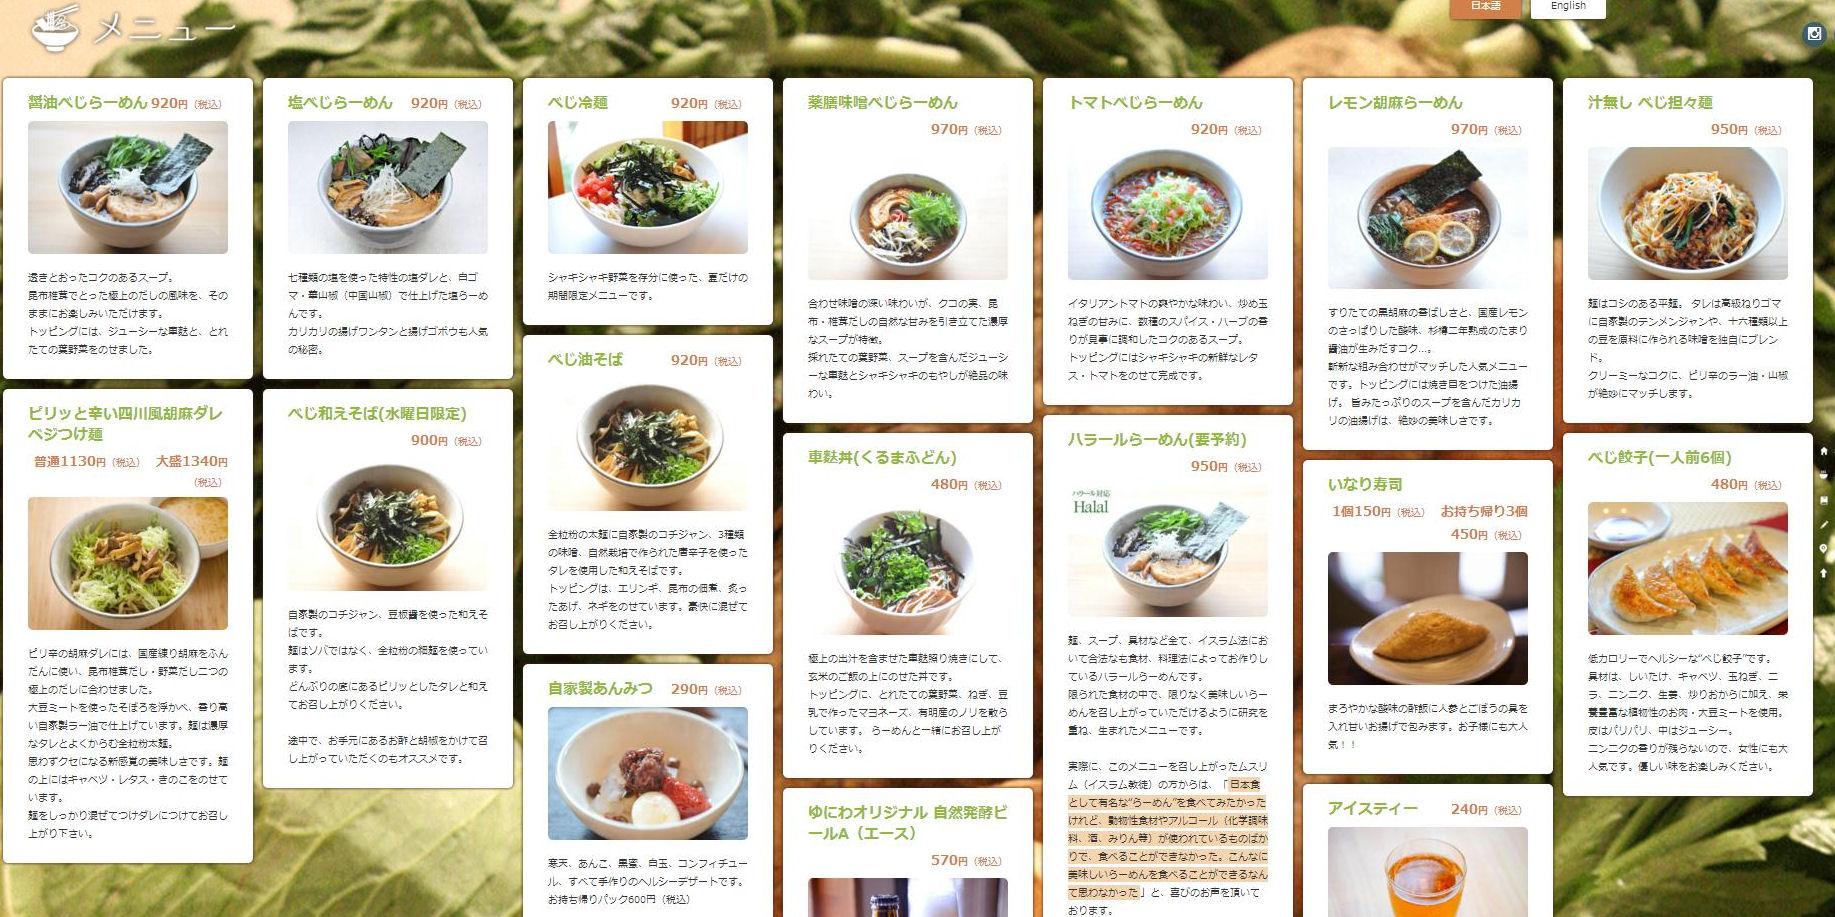 yuniwamenu1.jpg